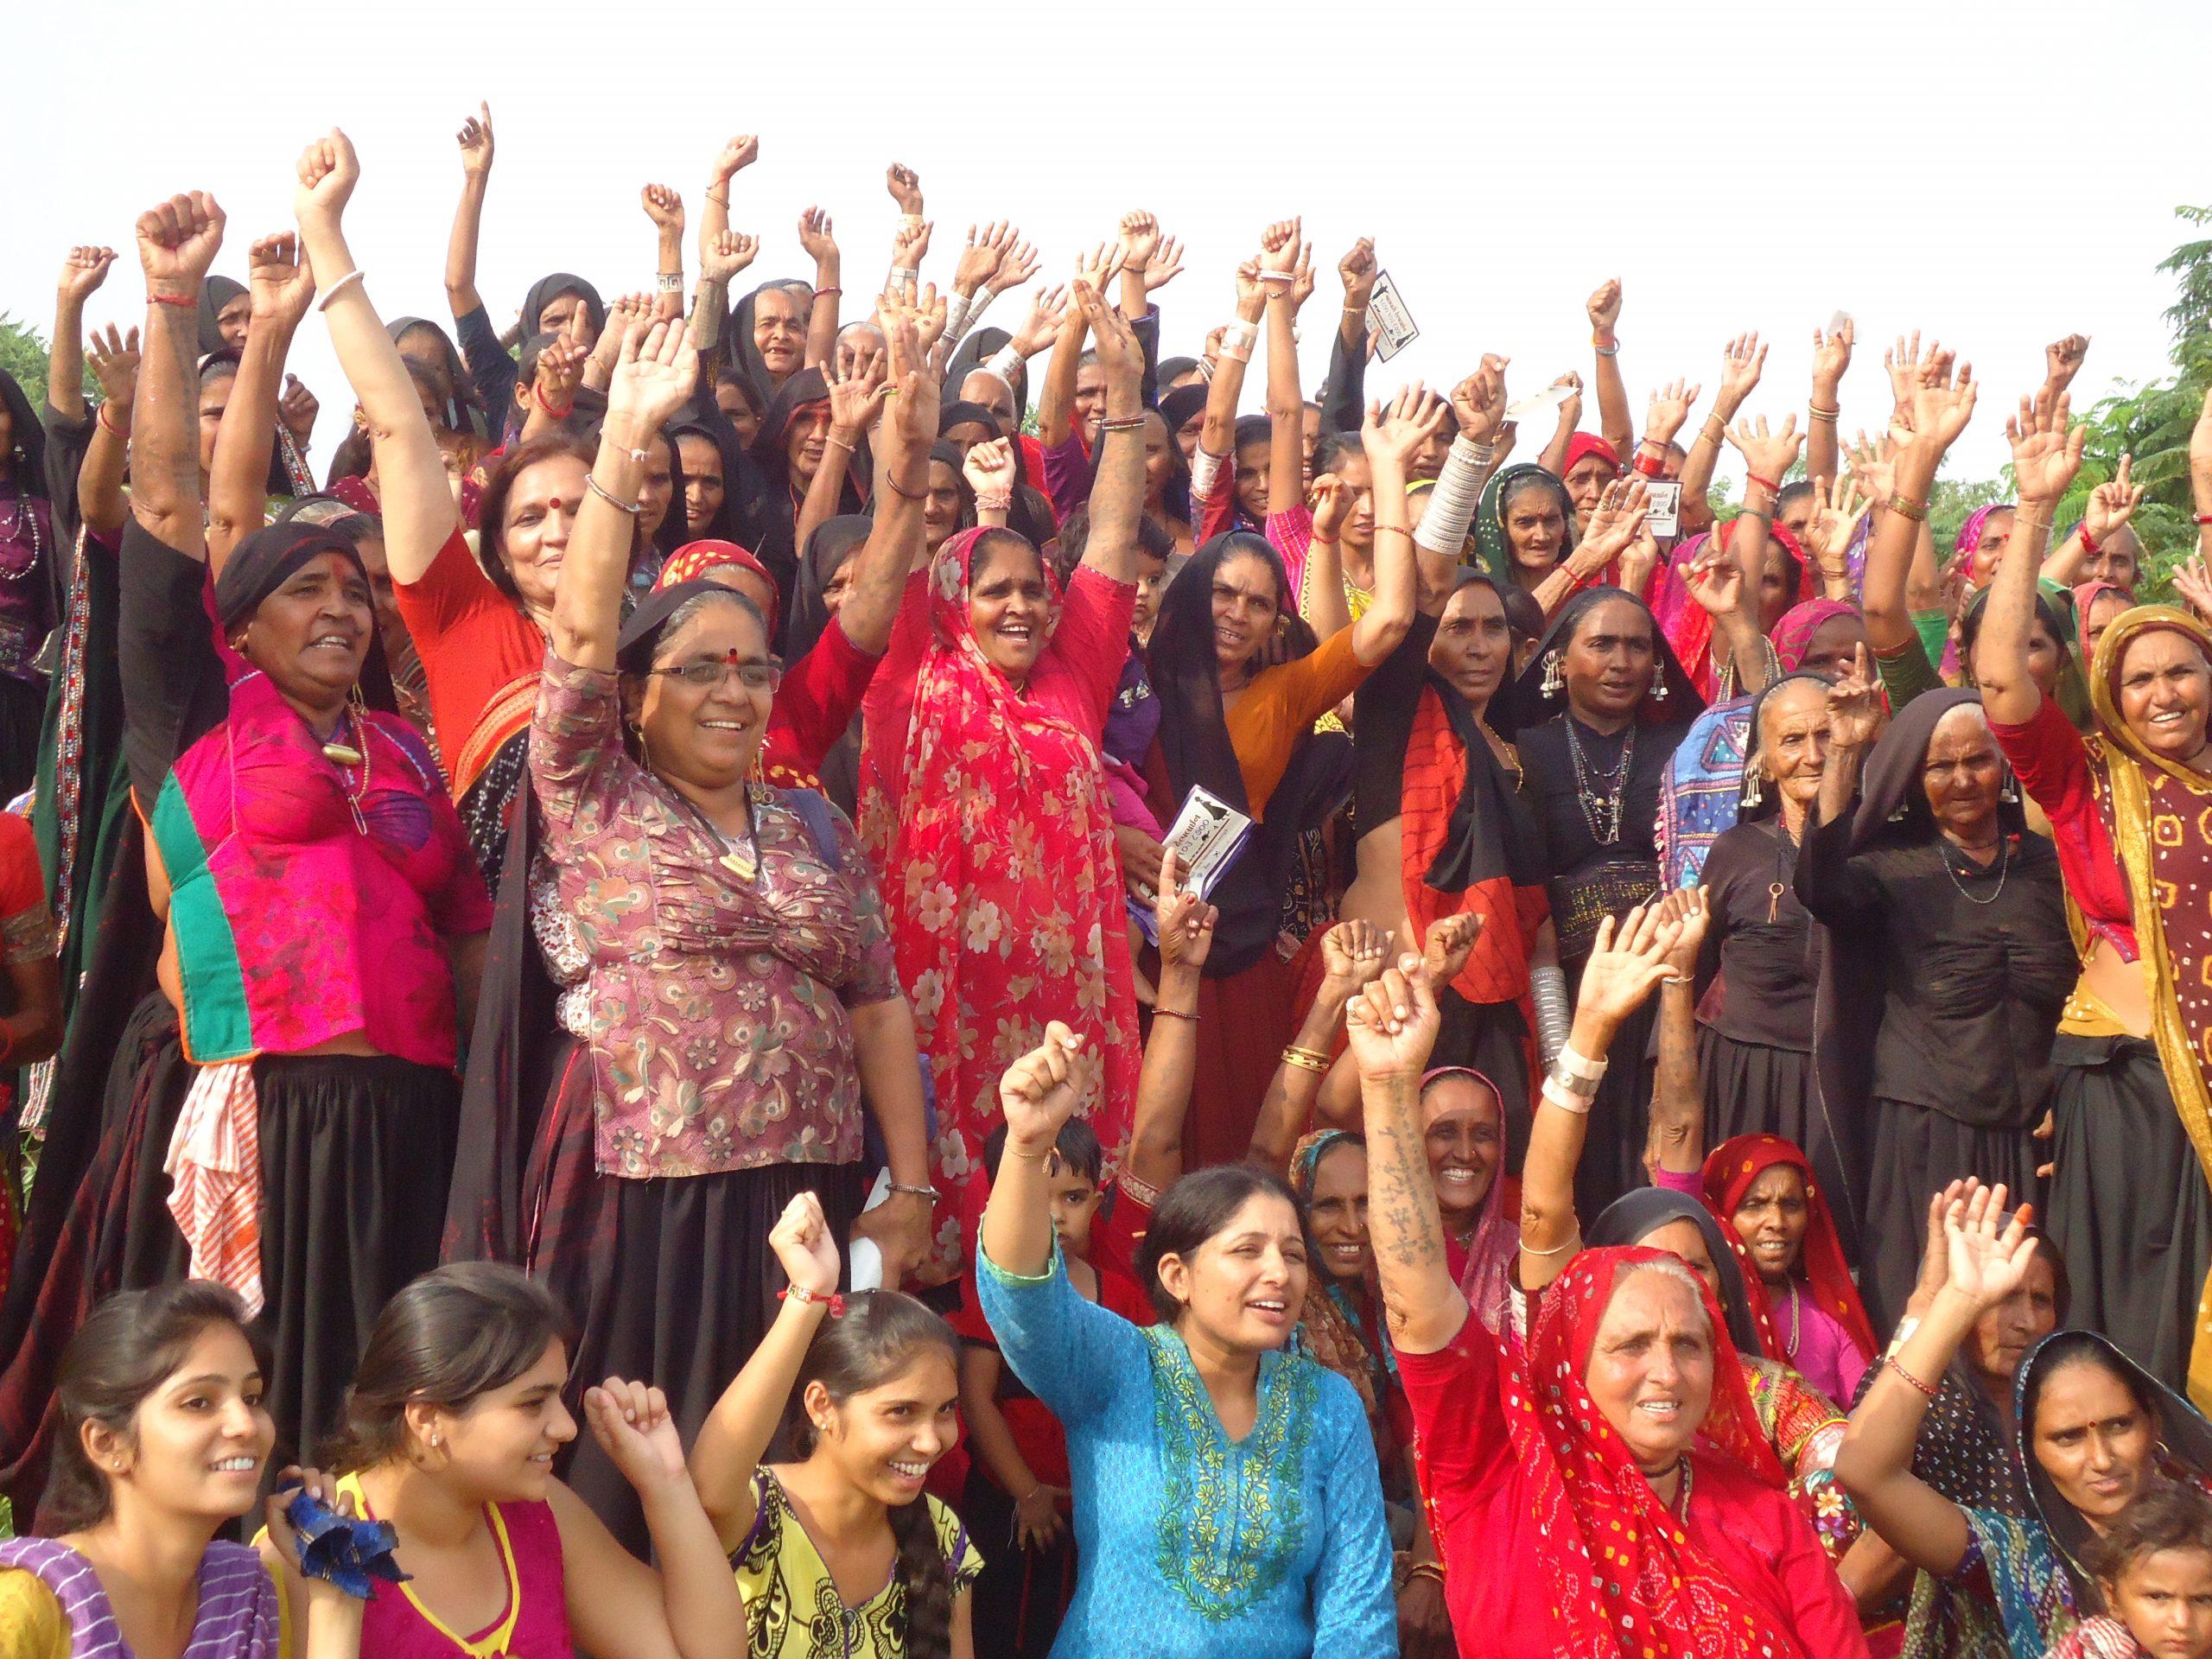 Meeting of Maldhari pastoralist women to protest against loss of grazing land to investment areas, Gujarat State, India (Photo Credit: MARAG/ Neeta Pandya).